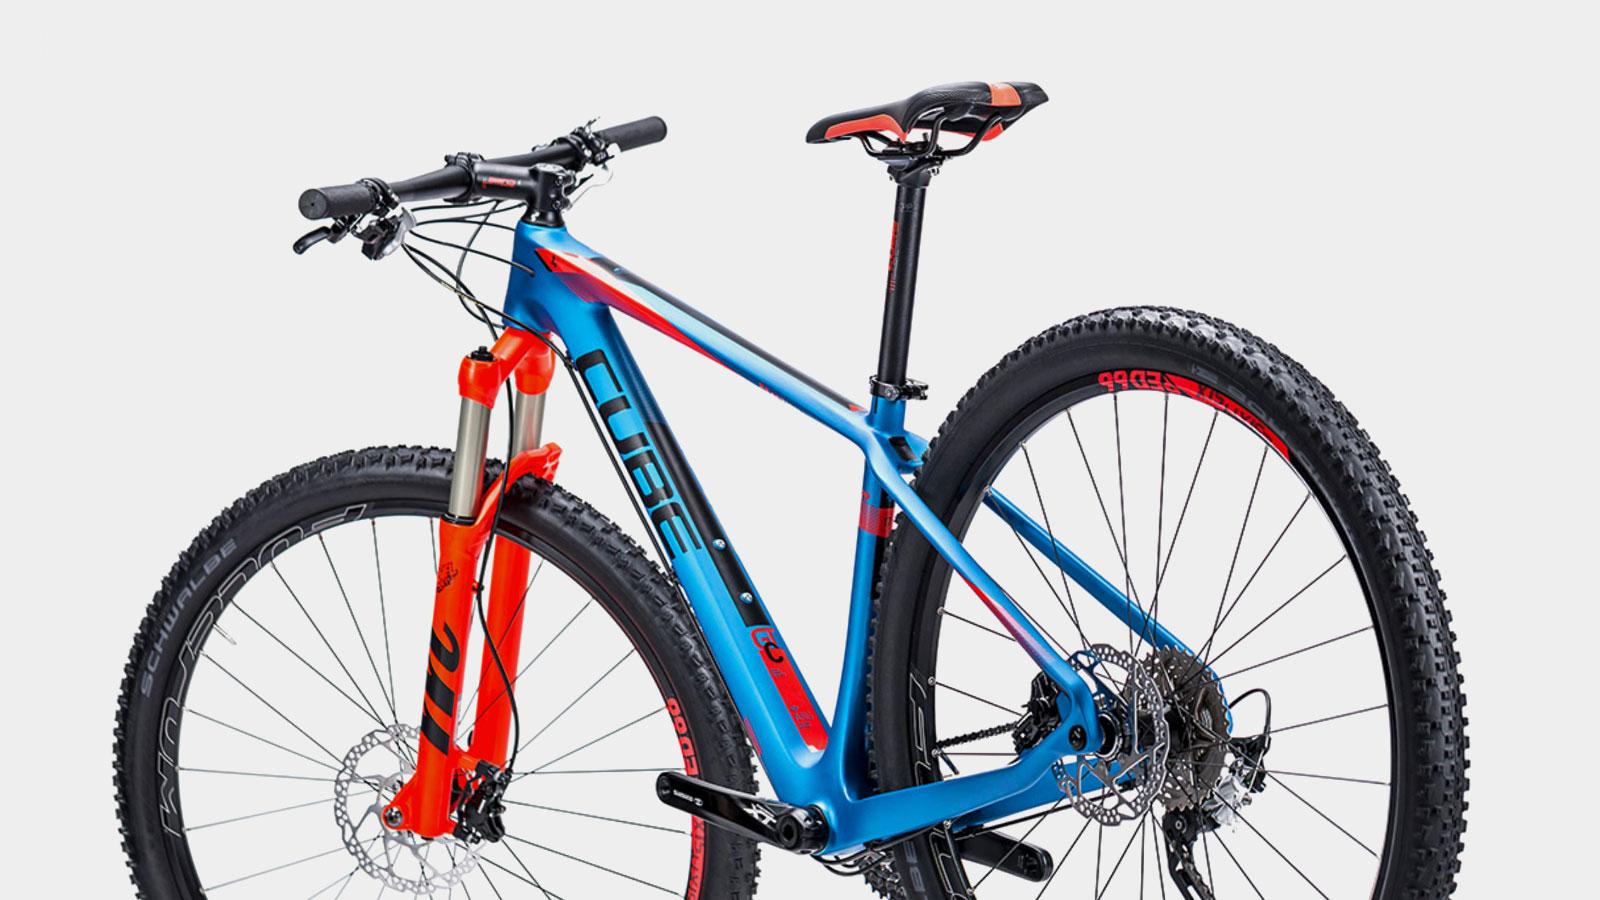 njustudio_cube_bikes_2015_slidebig3